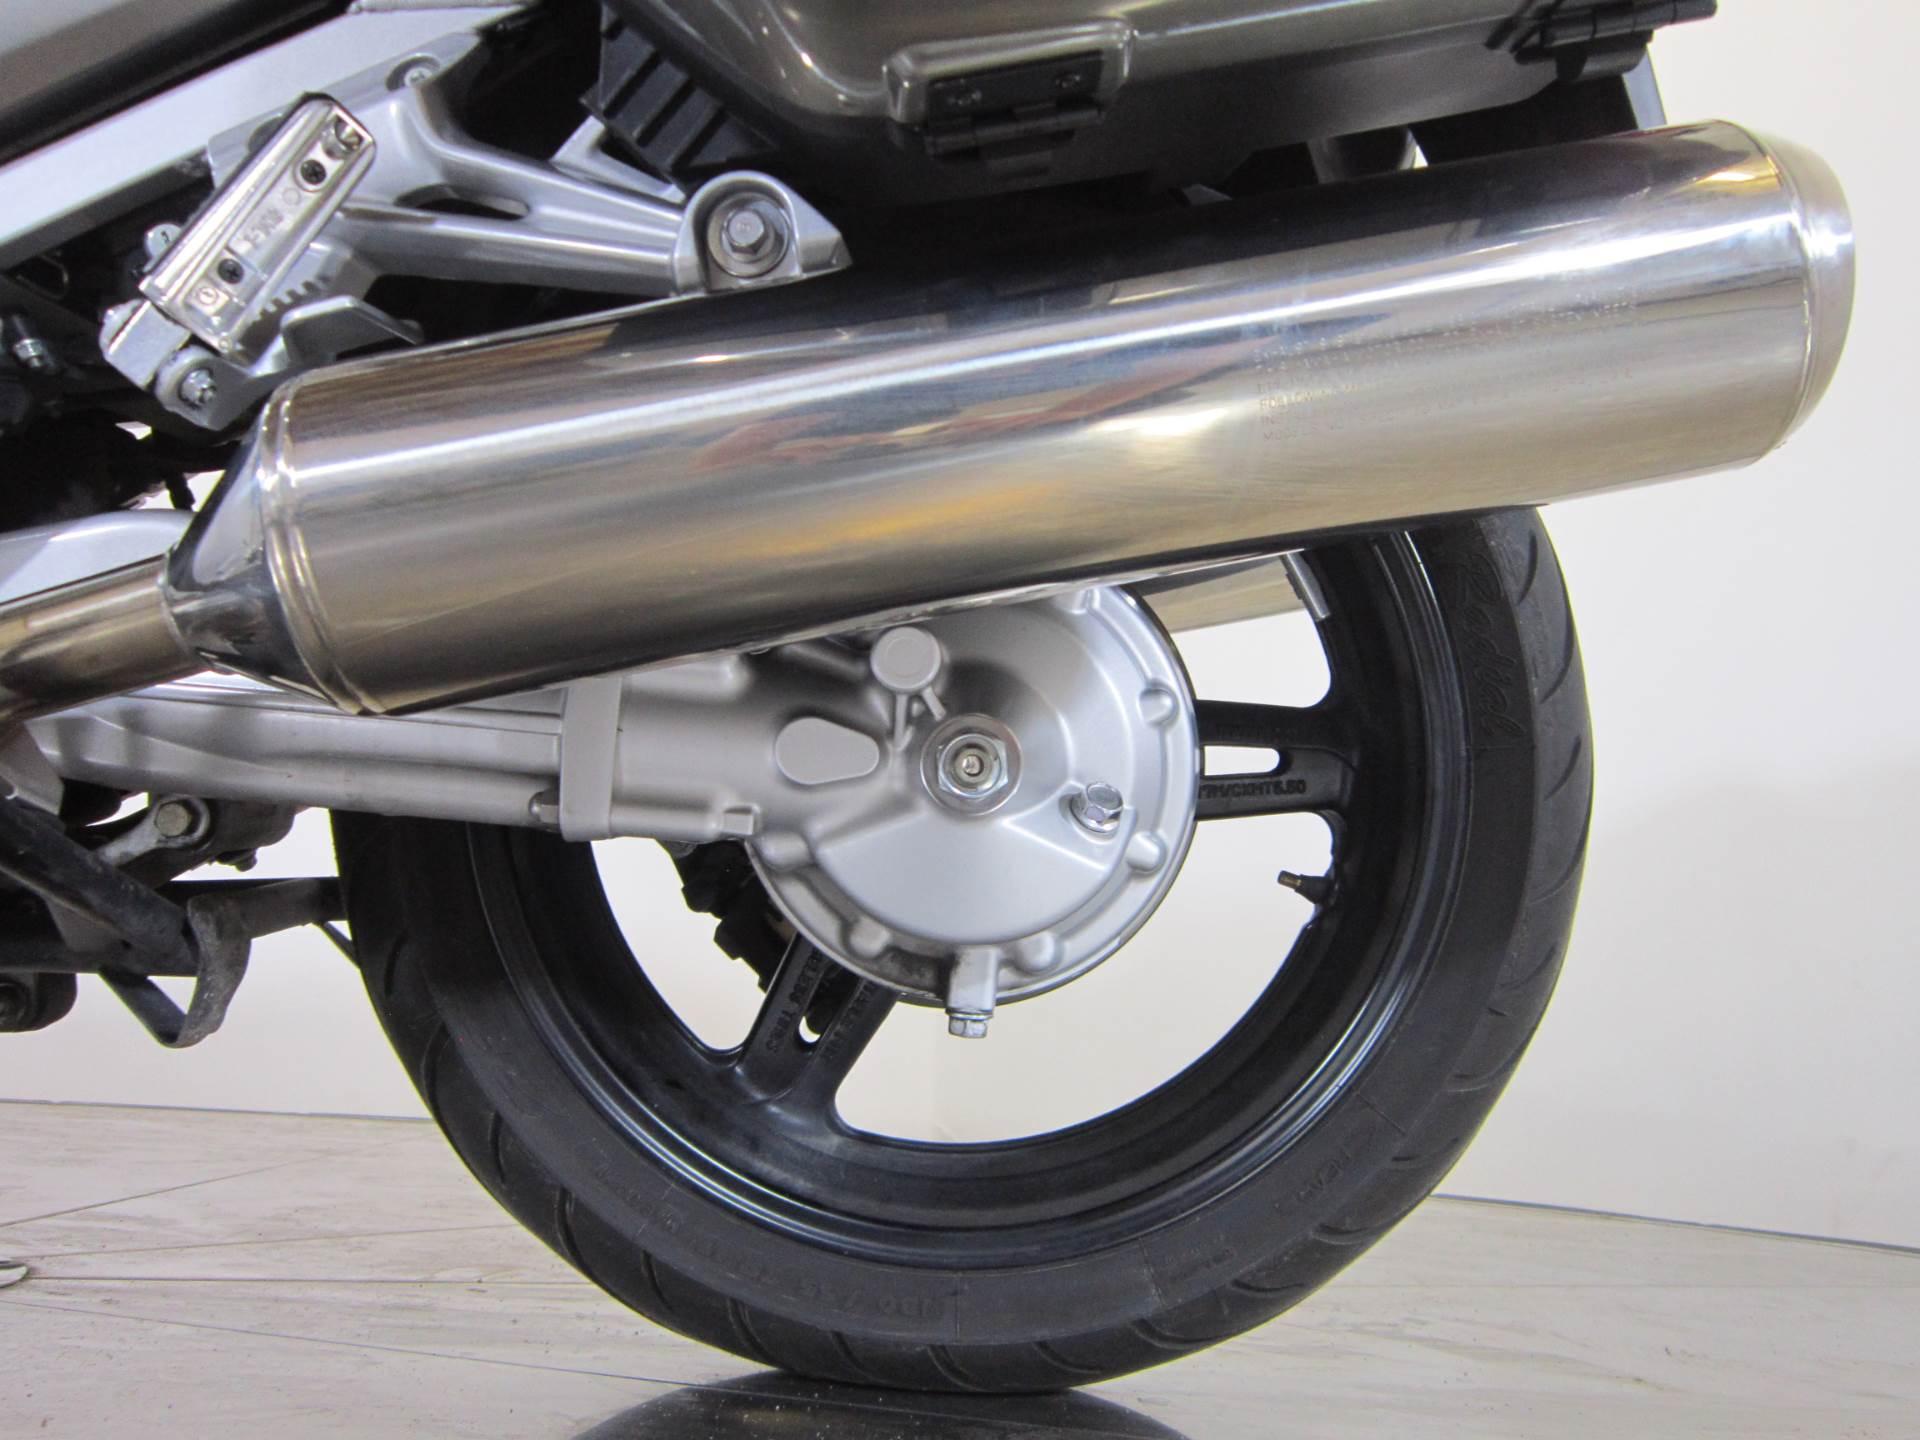 2013 Yamaha FJR1300A 7